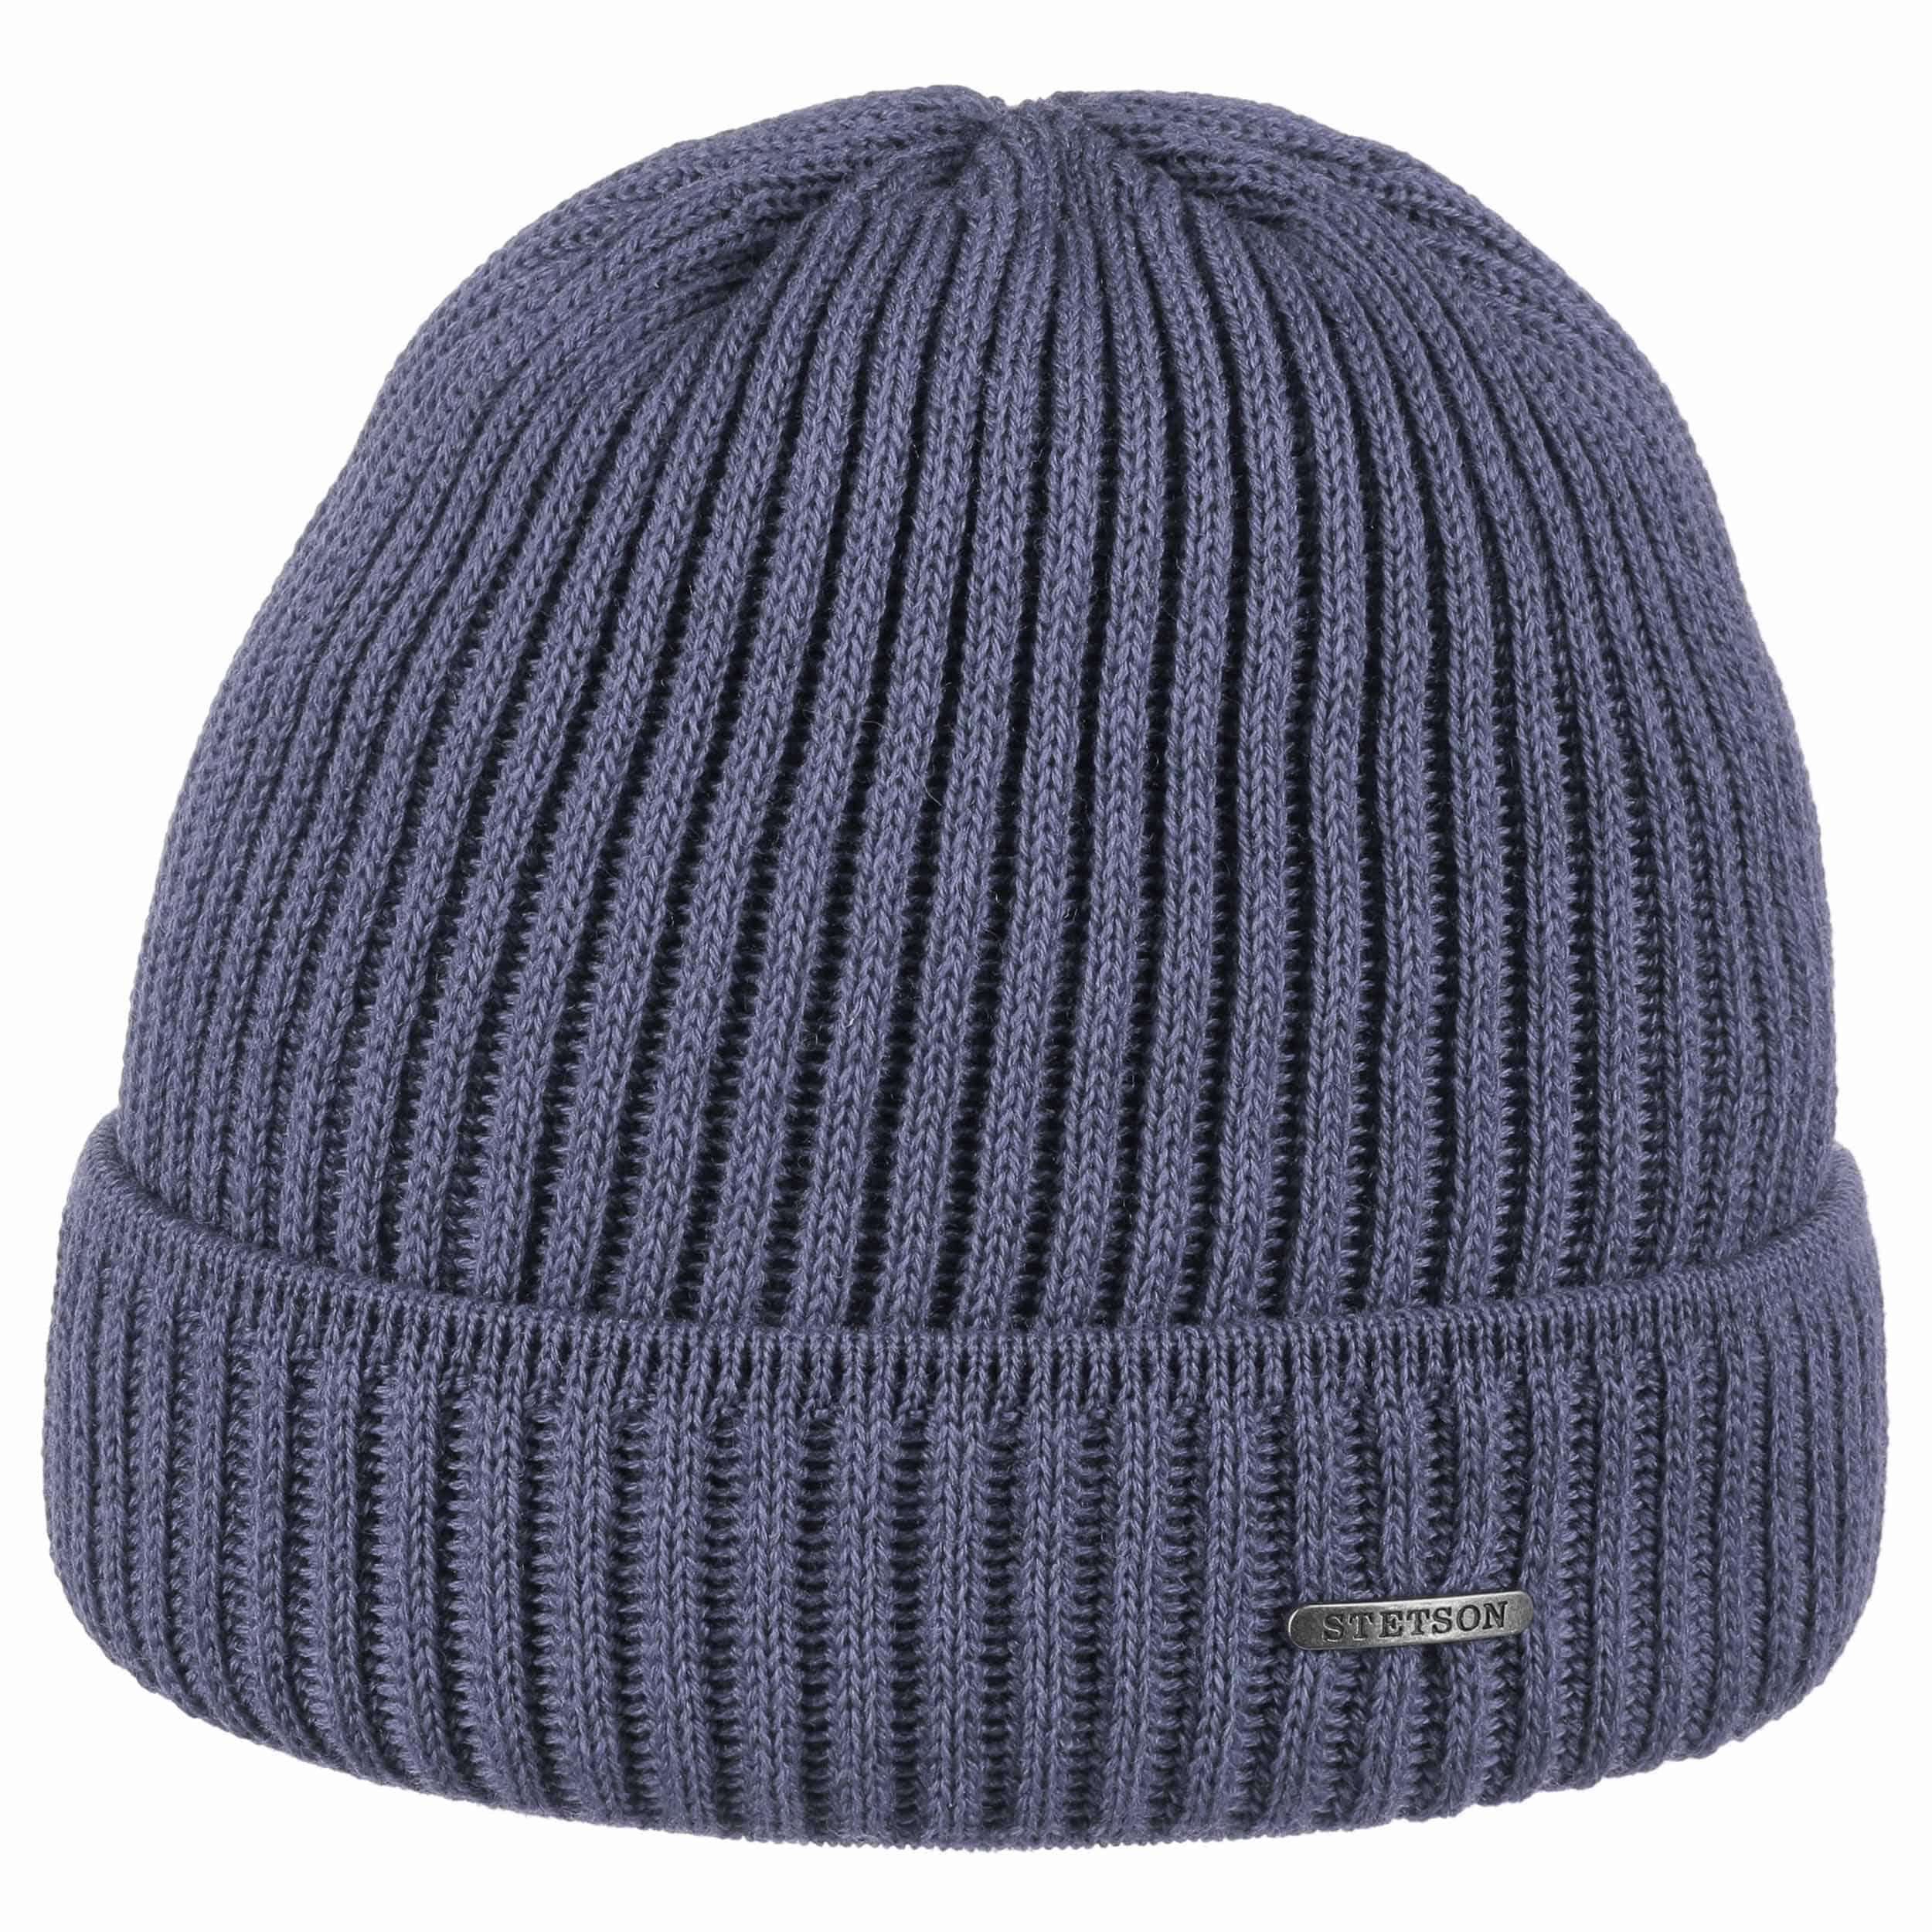 ... Parkman Knit Hat by Stetson - denim 3 ... e22fb2a9a18